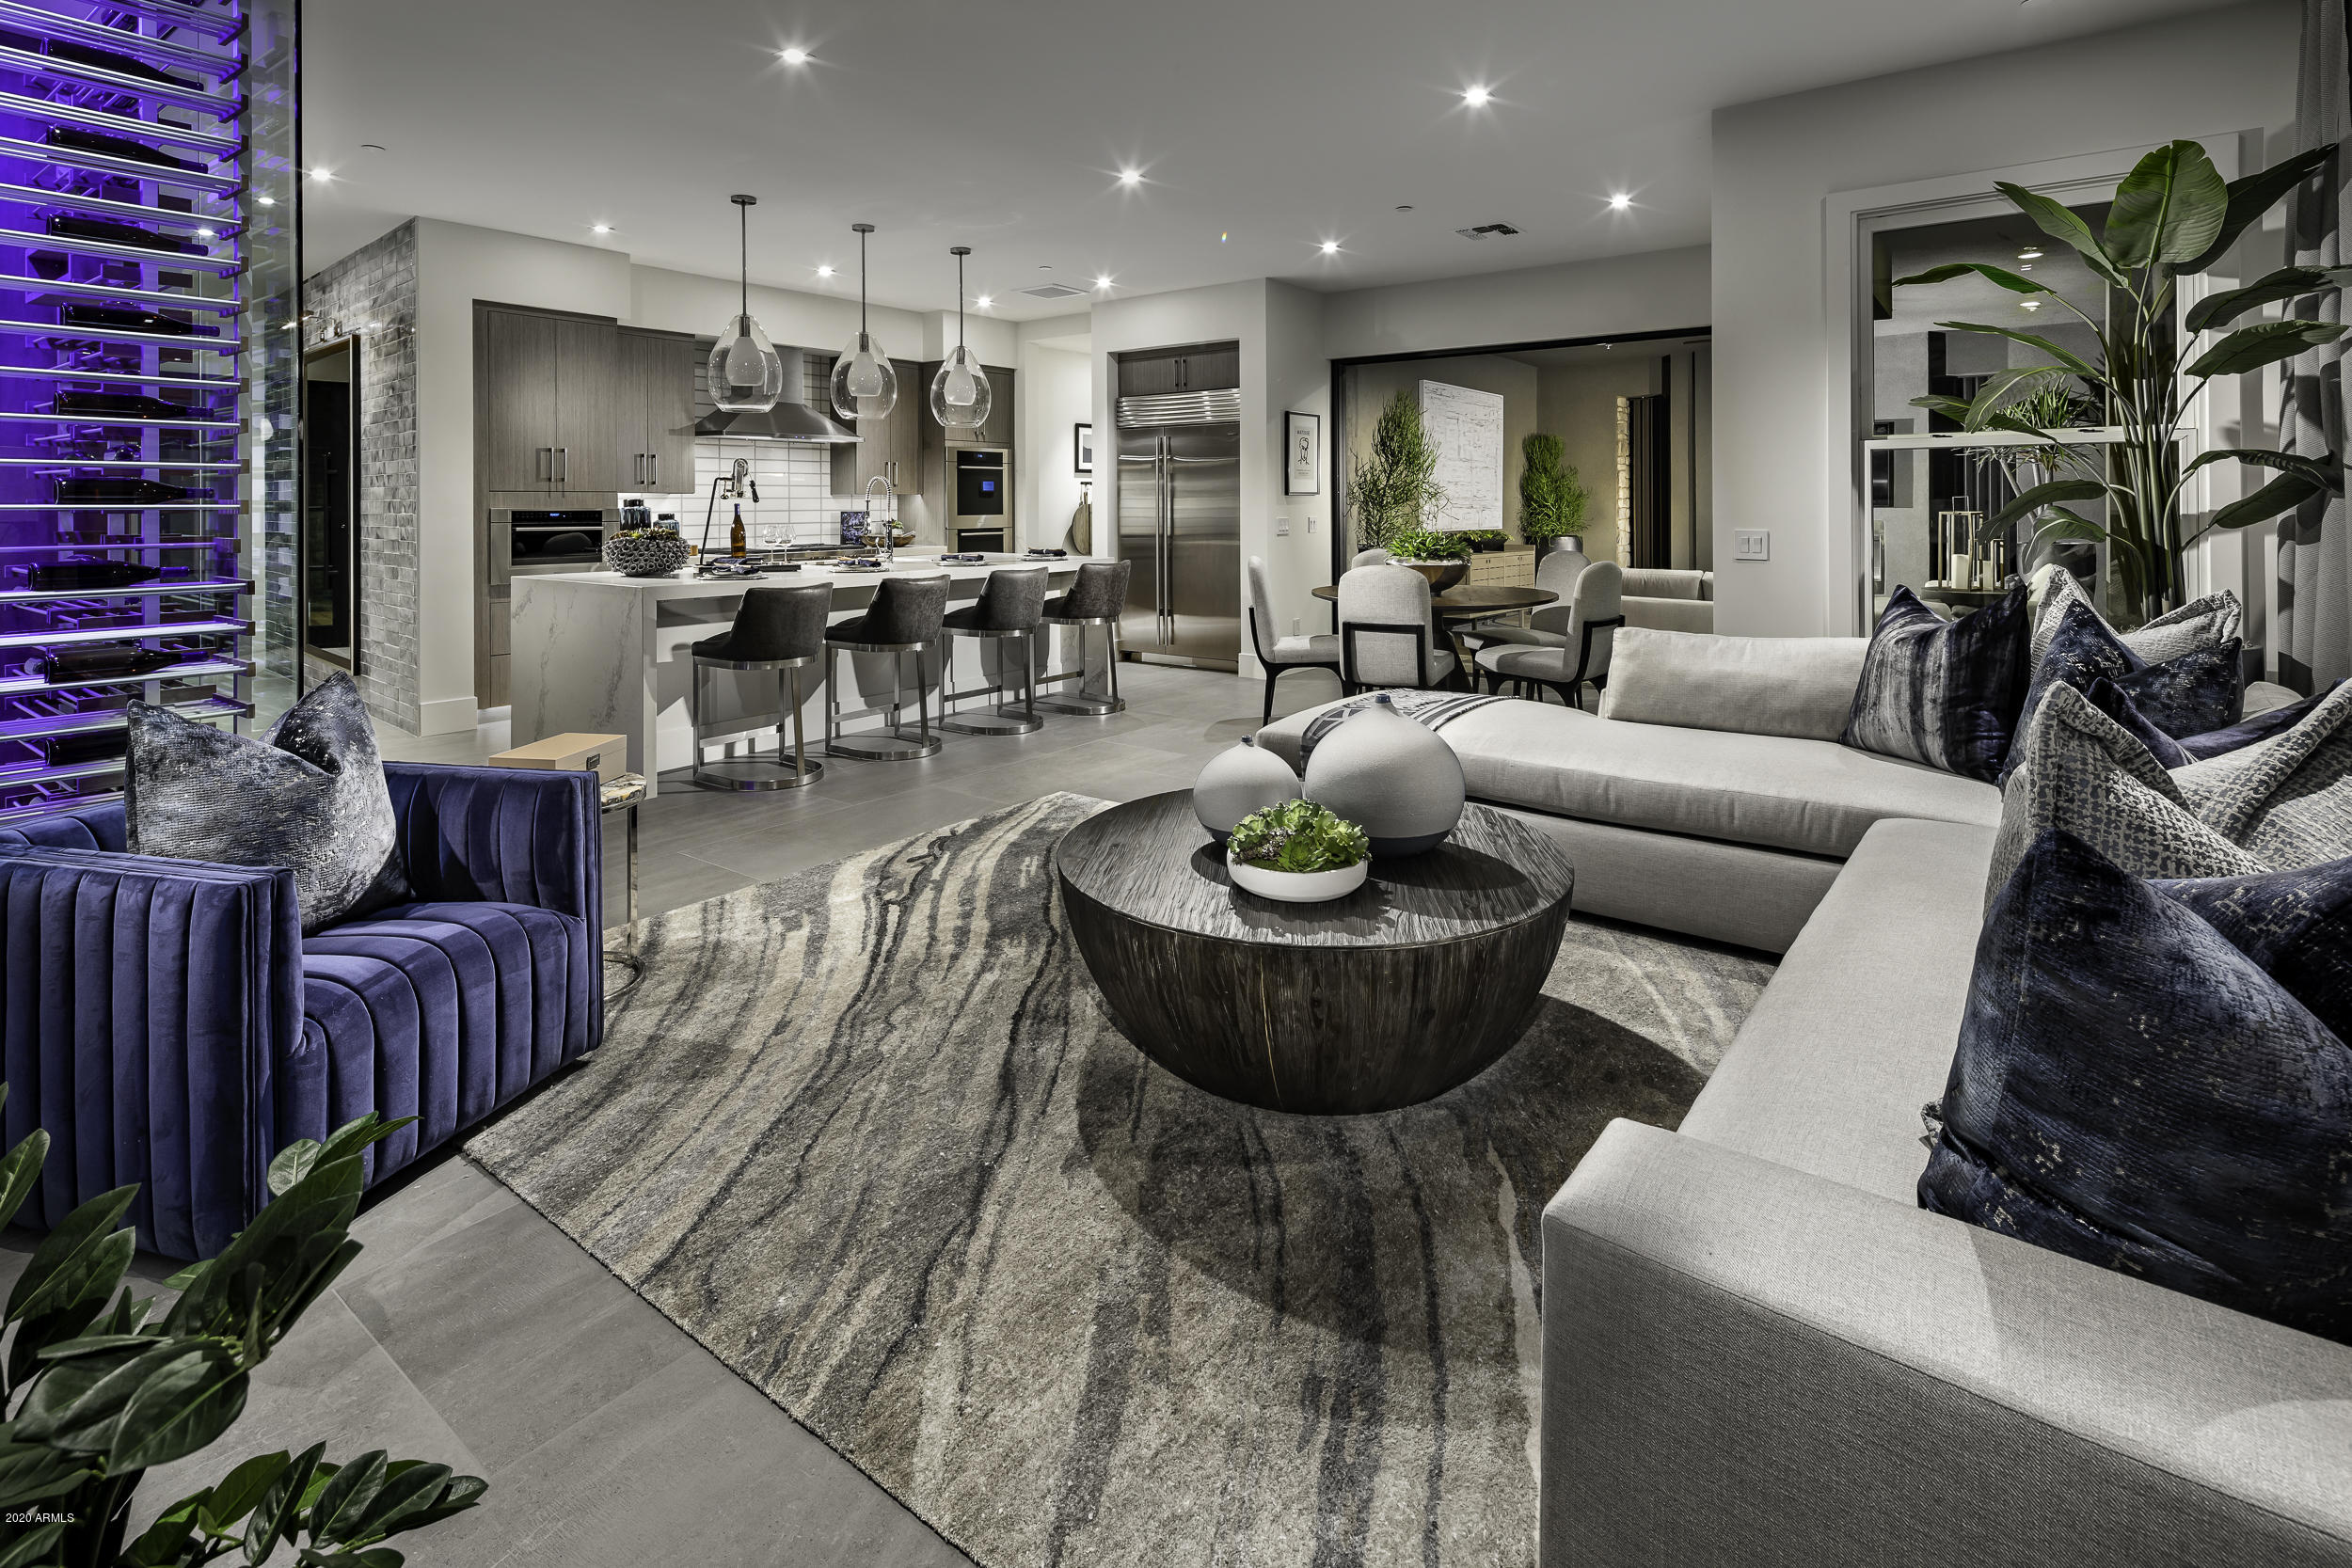 37200 CAVE CREEK Road, Scottsdale, Arizona 85262, 3 Bedrooms Bedrooms, ,3.5 BathroomsBathrooms,Residential,For Sale,CAVE CREEK,6182873